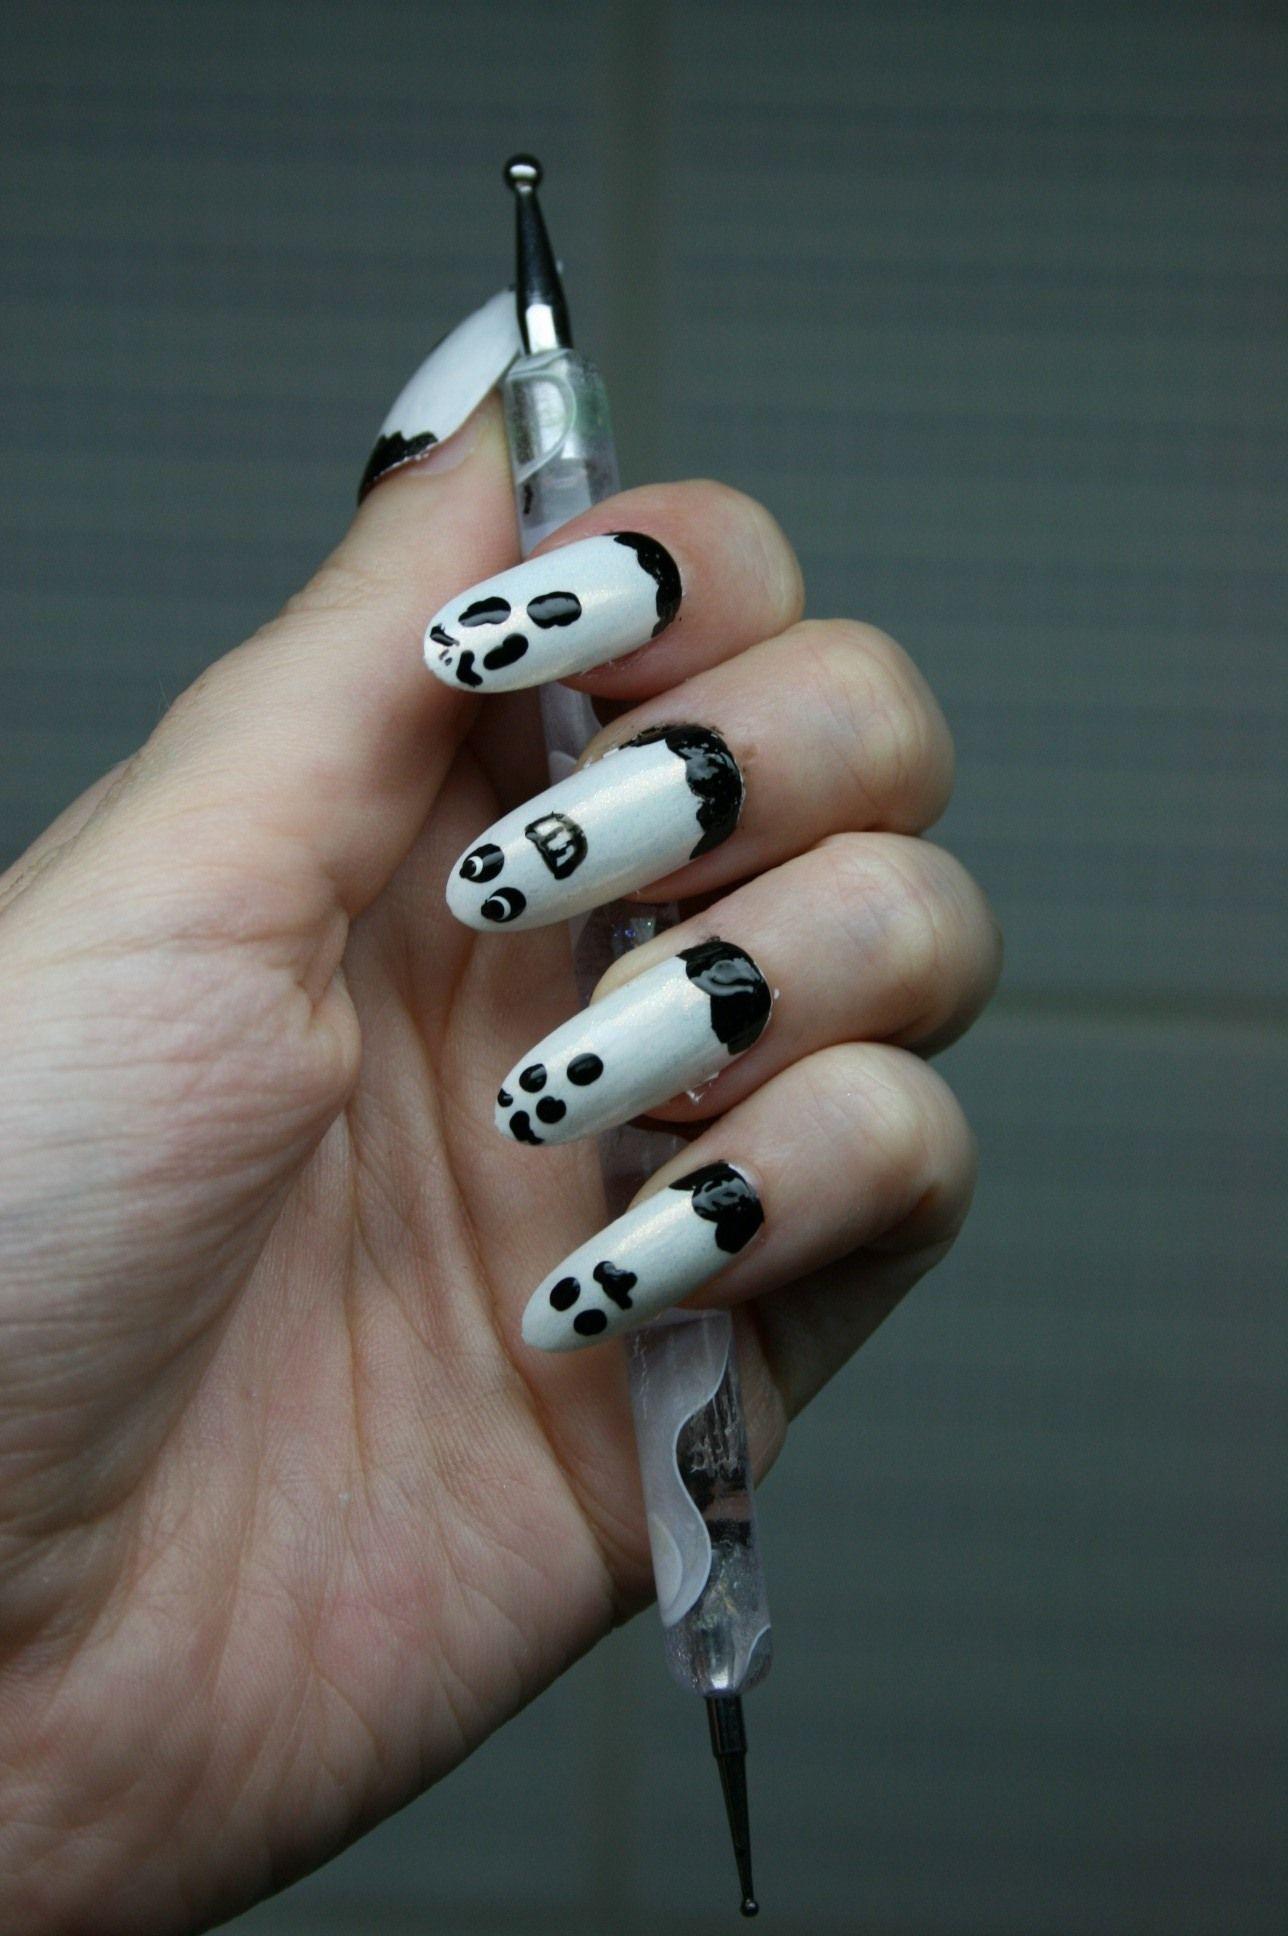 geln gel motive f r halloween 26 ideen zum selbermachen anleitung nageldesign nail art. Black Bedroom Furniture Sets. Home Design Ideas